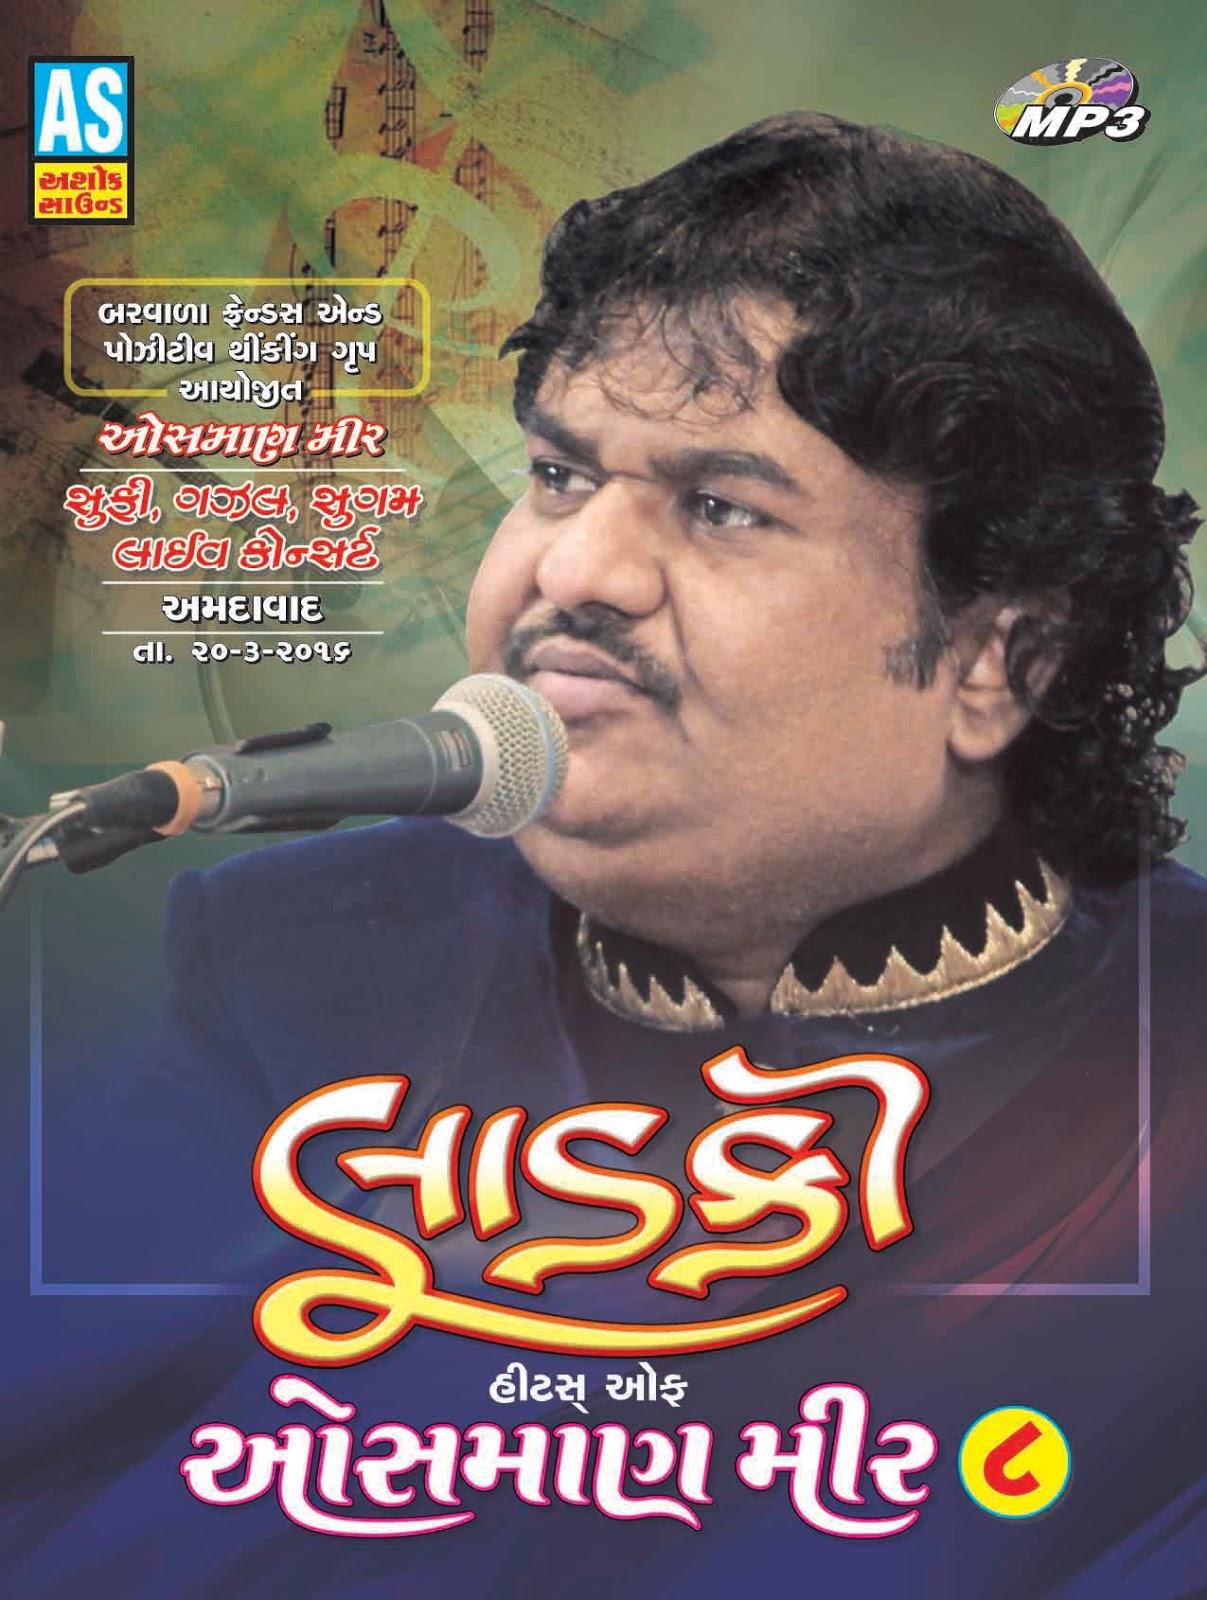 Gujarati Songs | Gujarati Garba | Gujarati Bhajan: Ladki